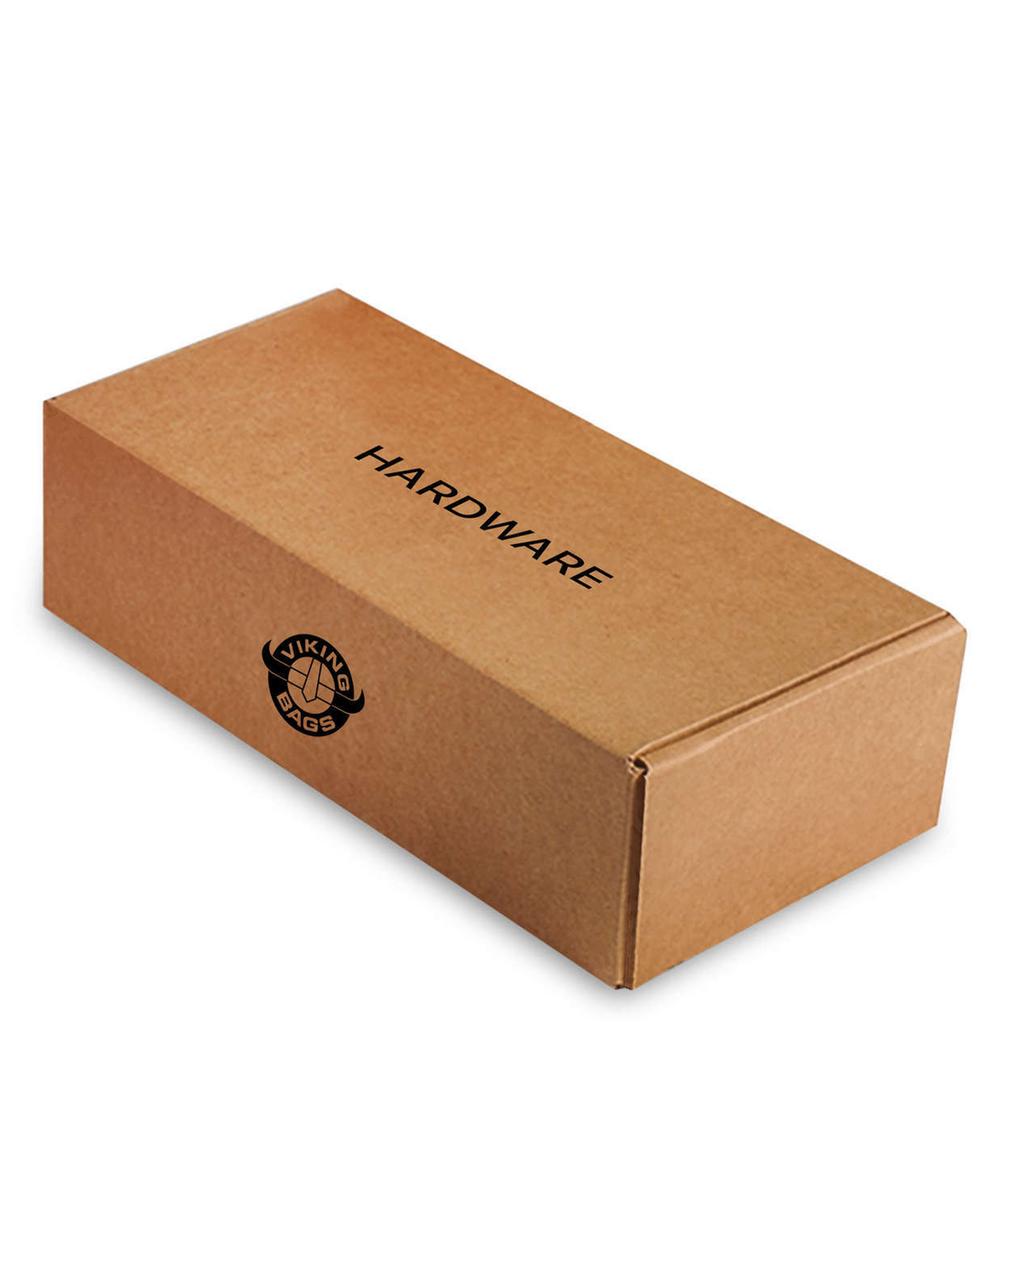 Suzuki Boulevard M90, VZ1500 Viking Lamellar Large Black Hard Saddlebags Hardware Box